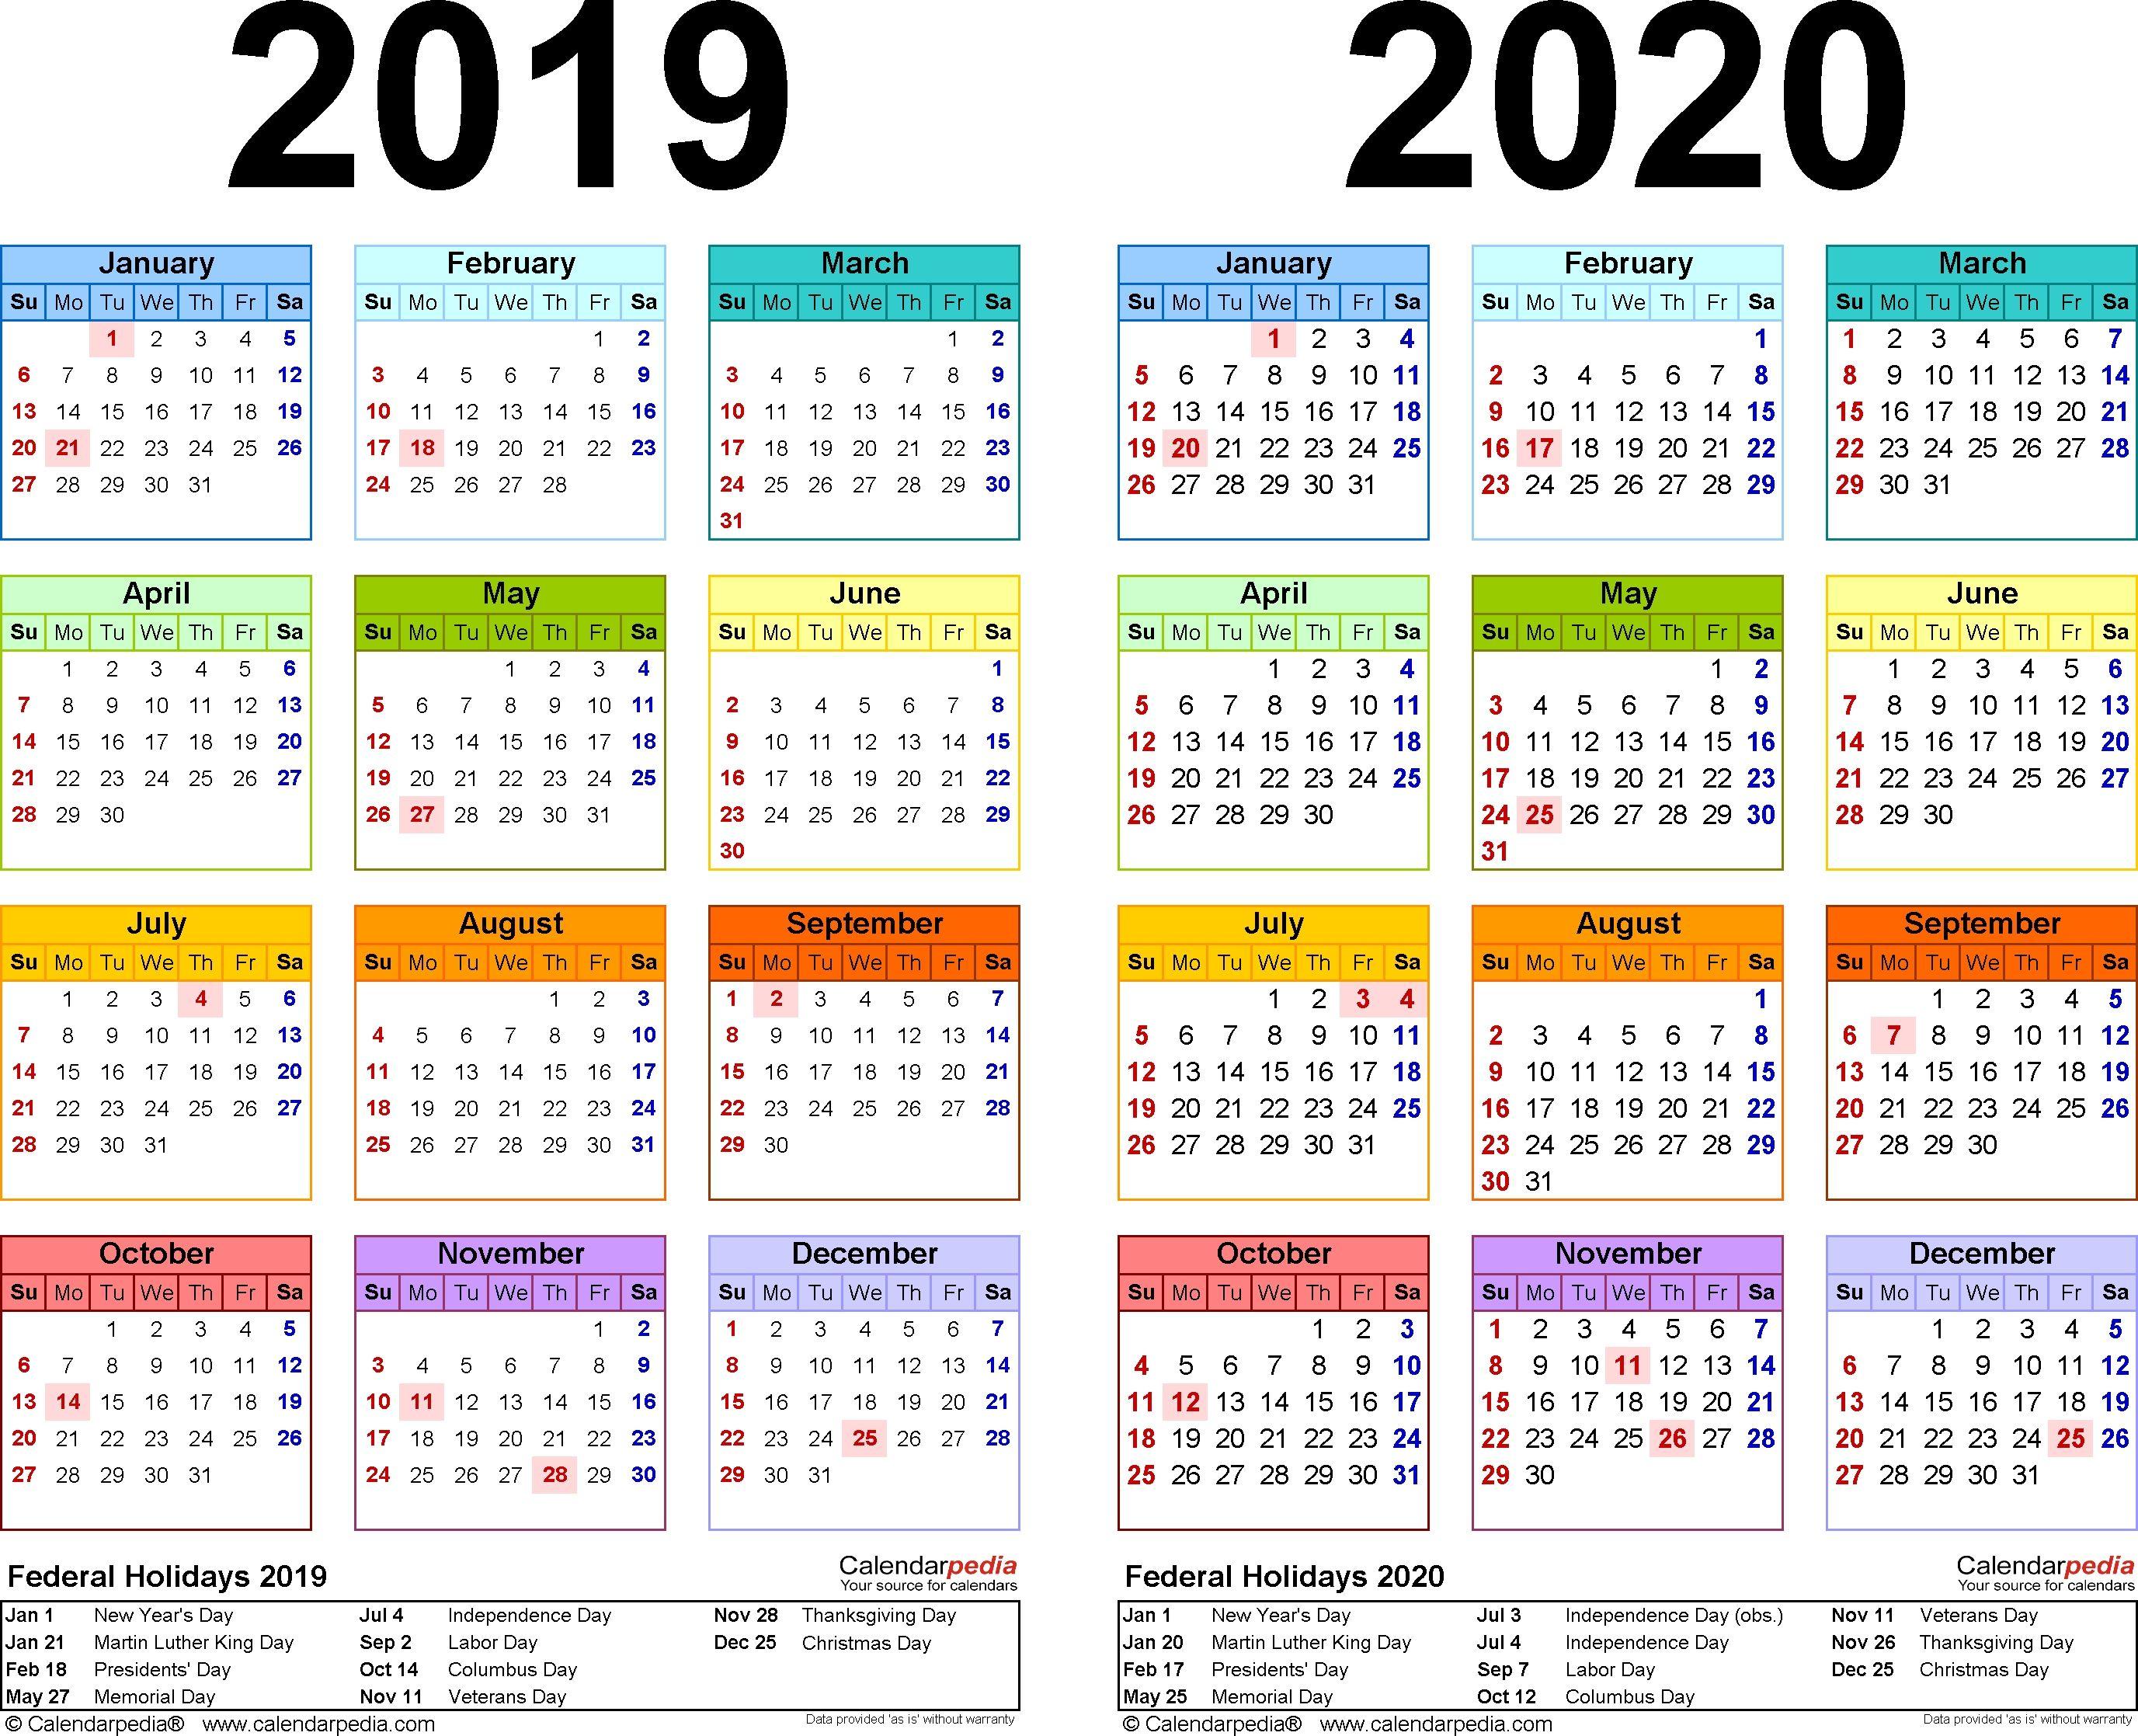 2019-2020 Calendar - Free Printable Two-Year Excel Calendars 2020 pertaining to 2020 Calendar Printable Free Pdf